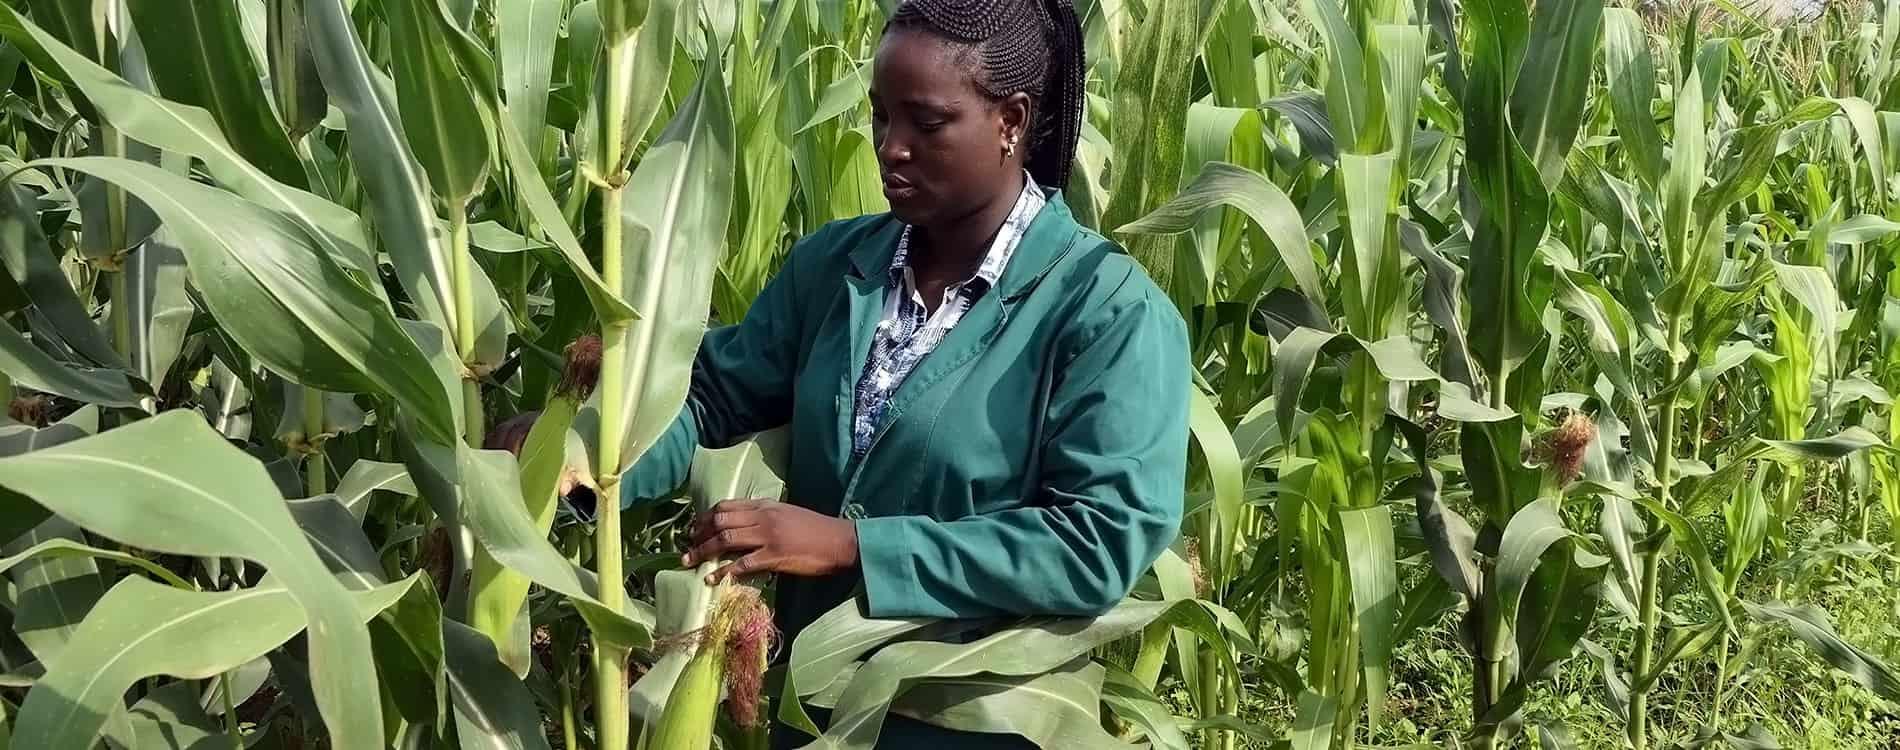 IITA-BIP sets record for maize production per hectare in Nigeria